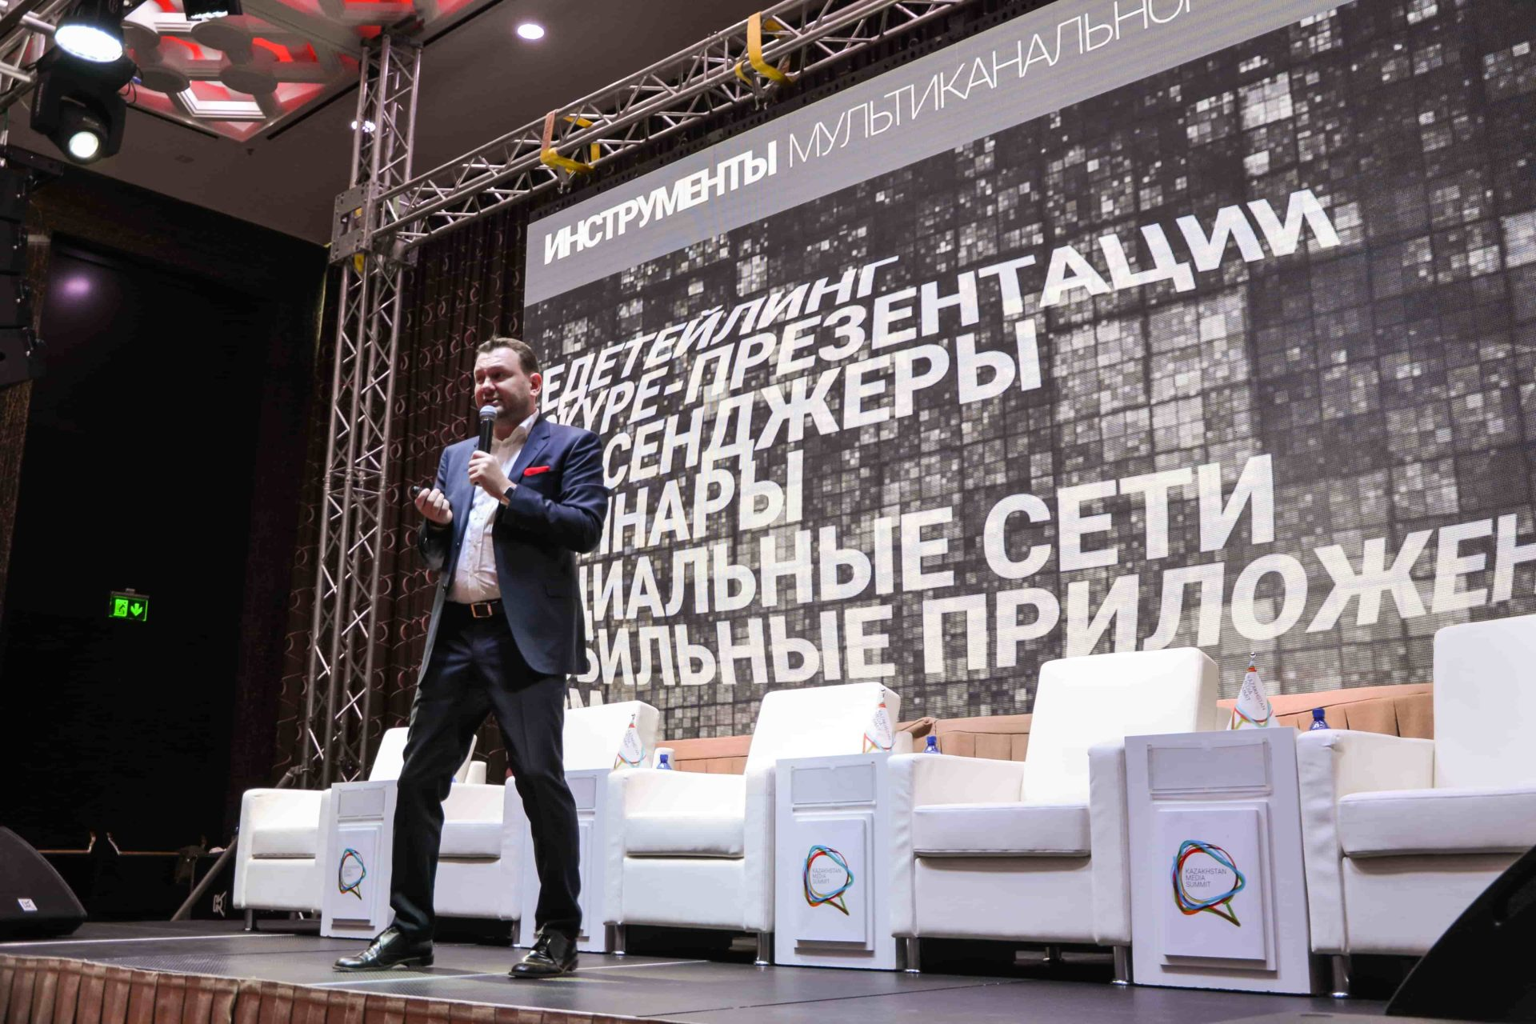 Октябрьская цифровая революция